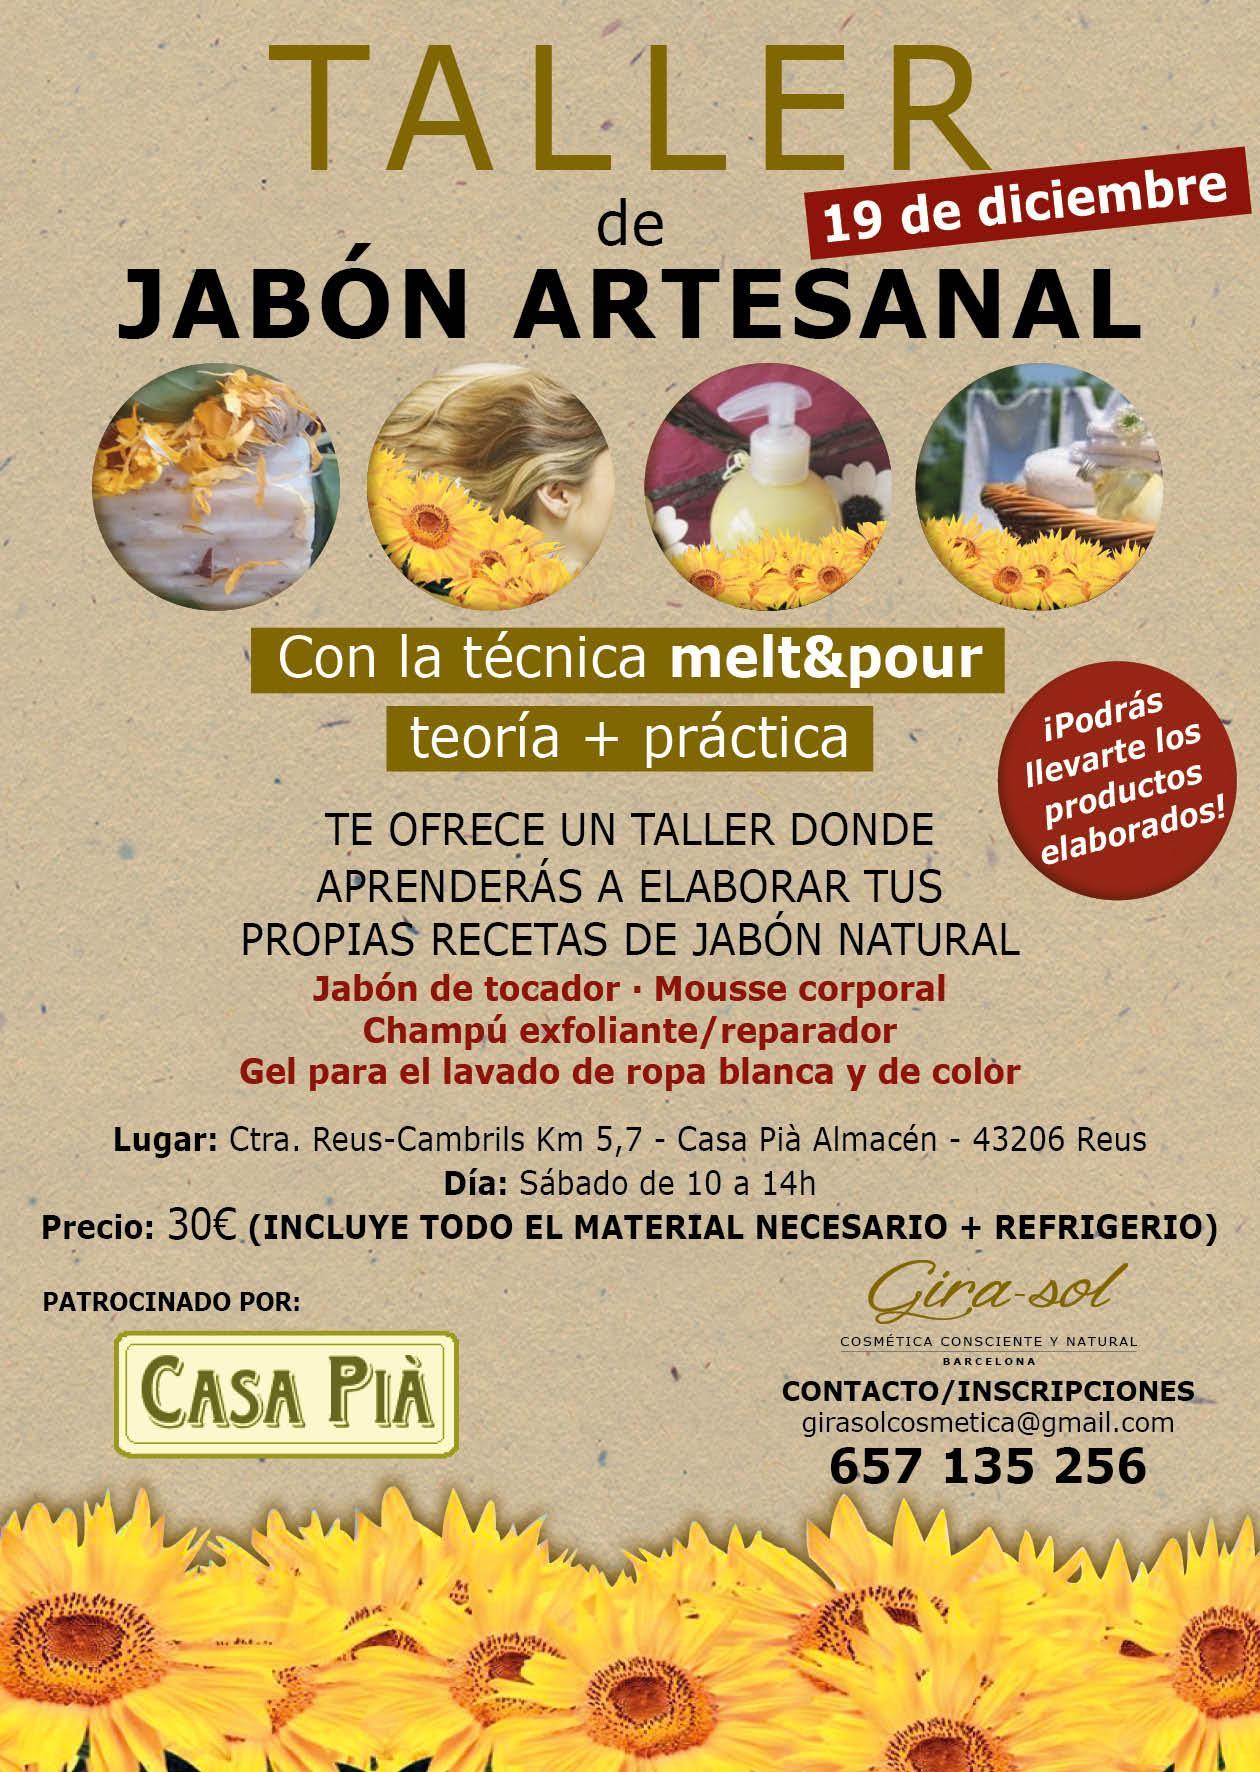 cartel-taller-jabon-artesanal